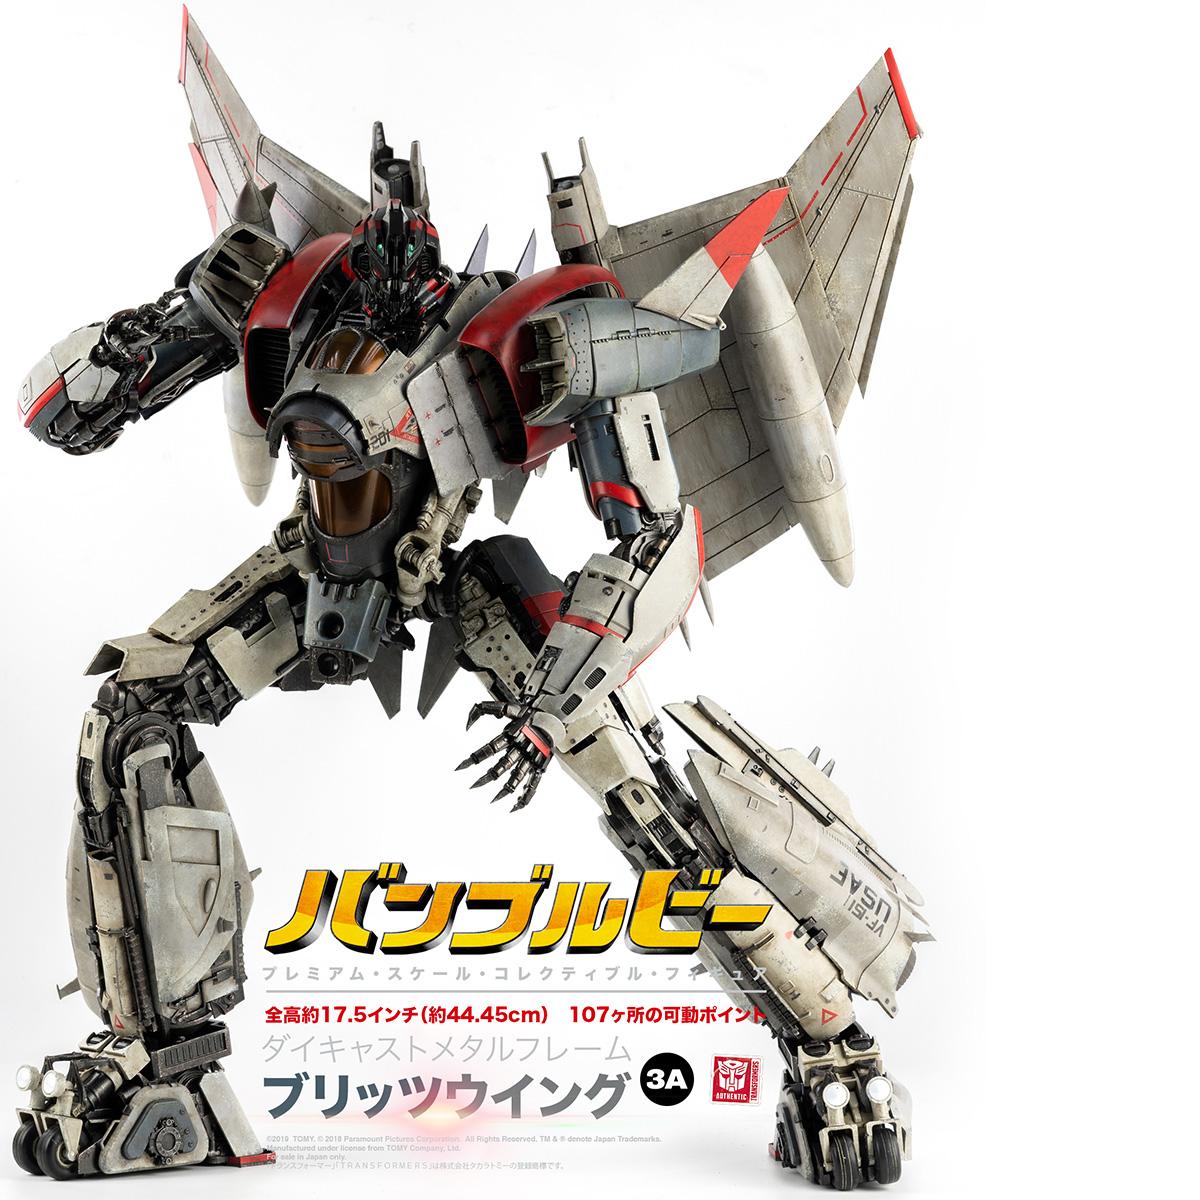 Blitzwing_PM_JAP_0960.jpg